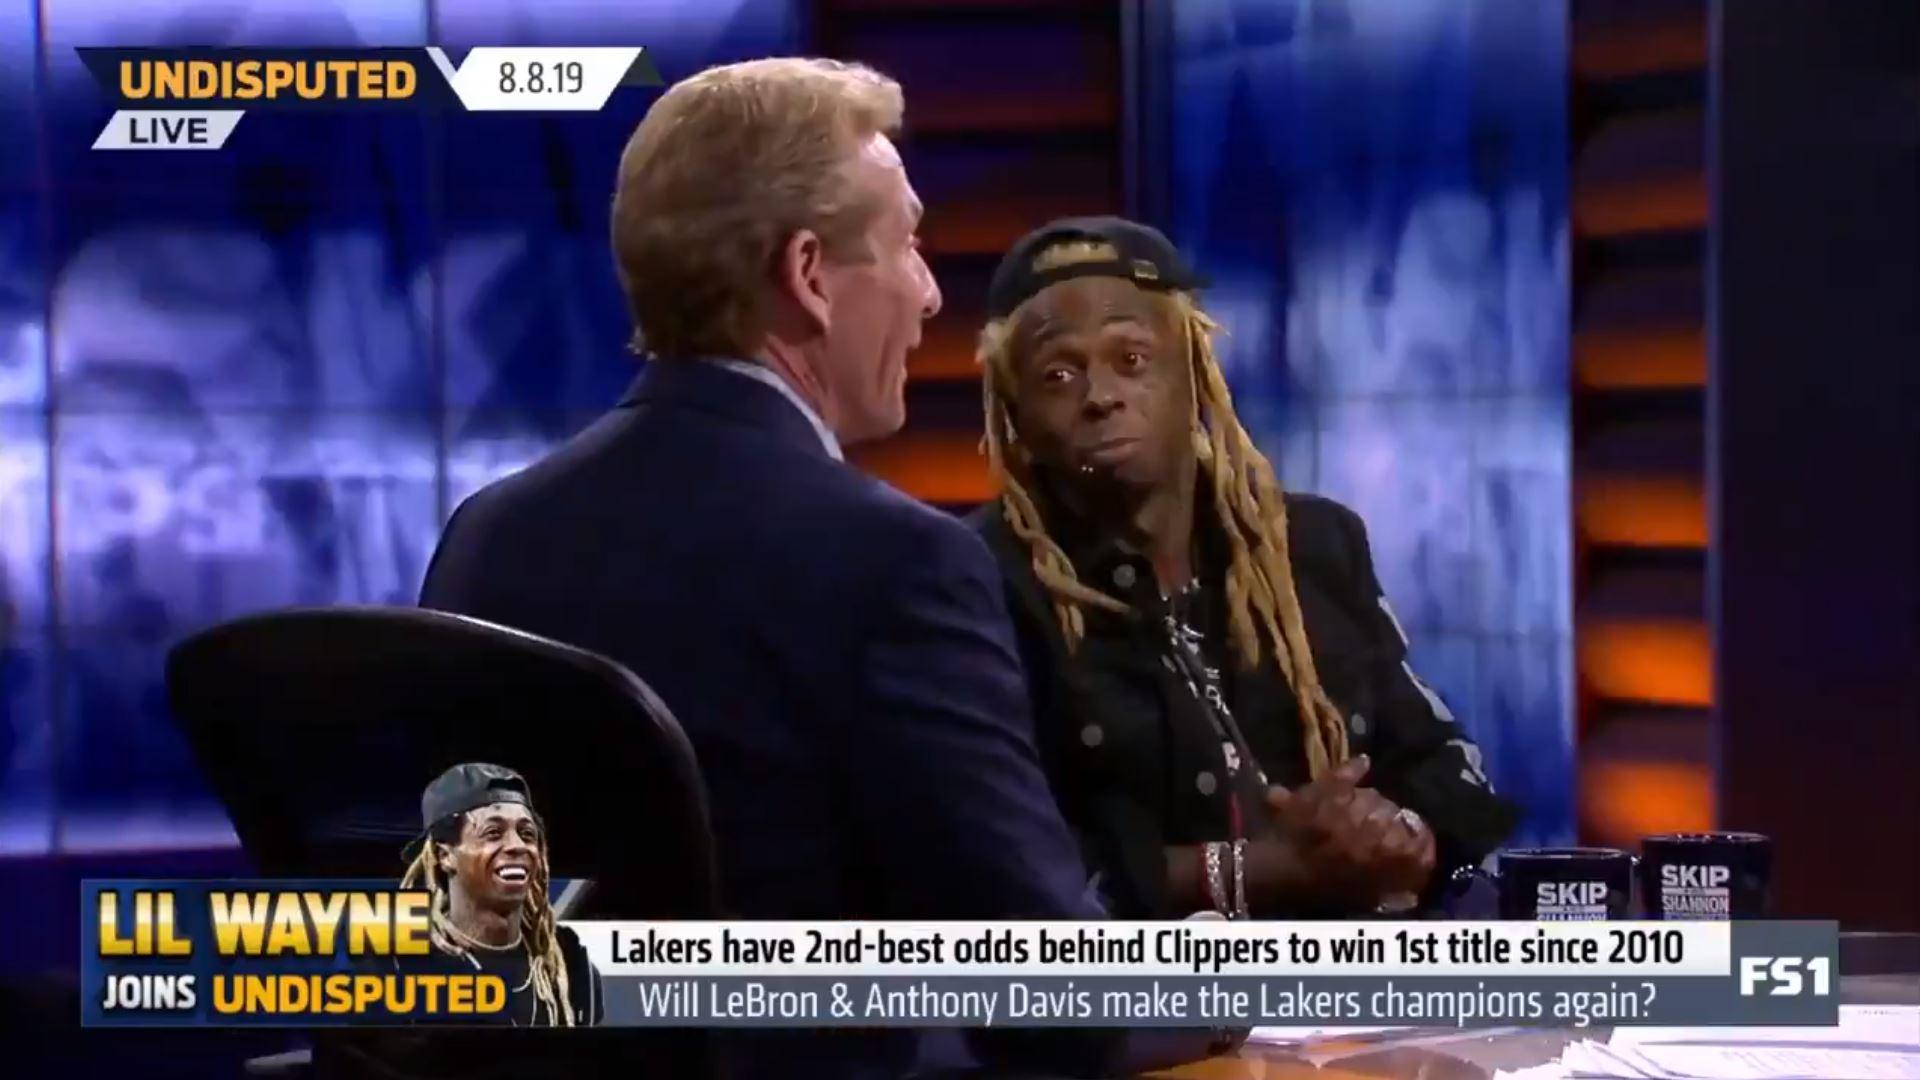 Lil Wayne and Skip Bayless